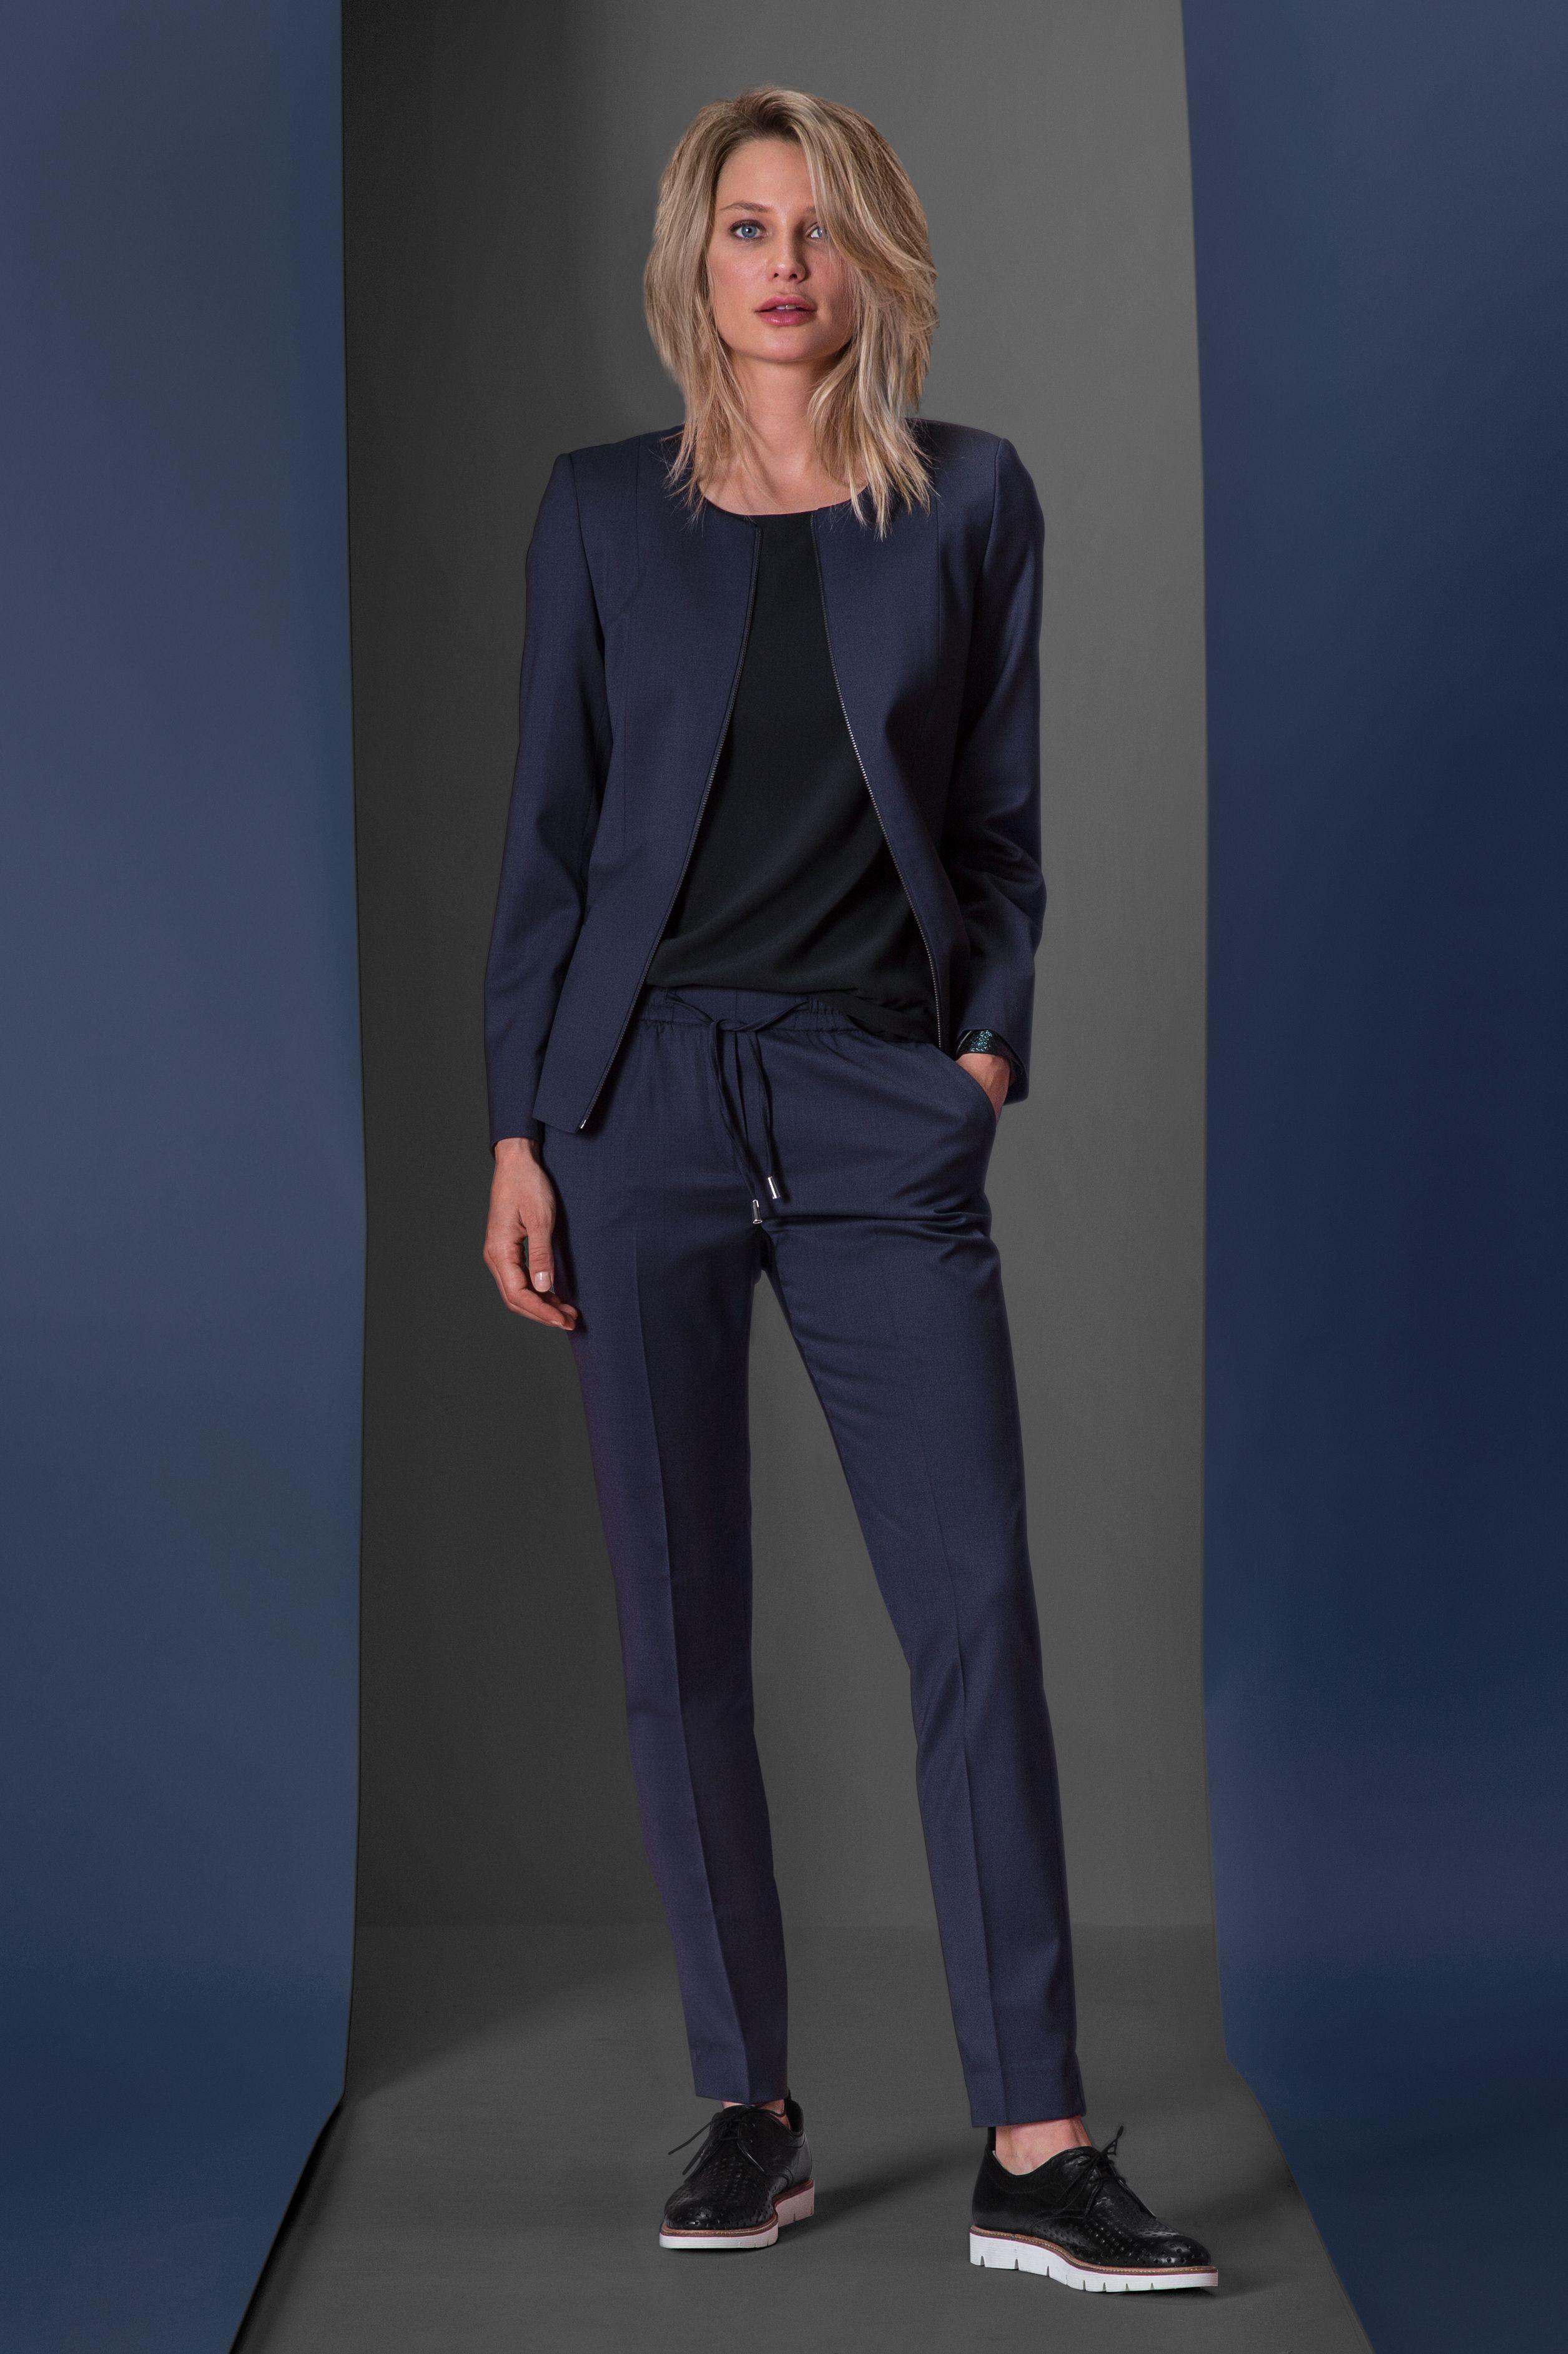 COLLECTION 2019/20 - Women business look - blazer